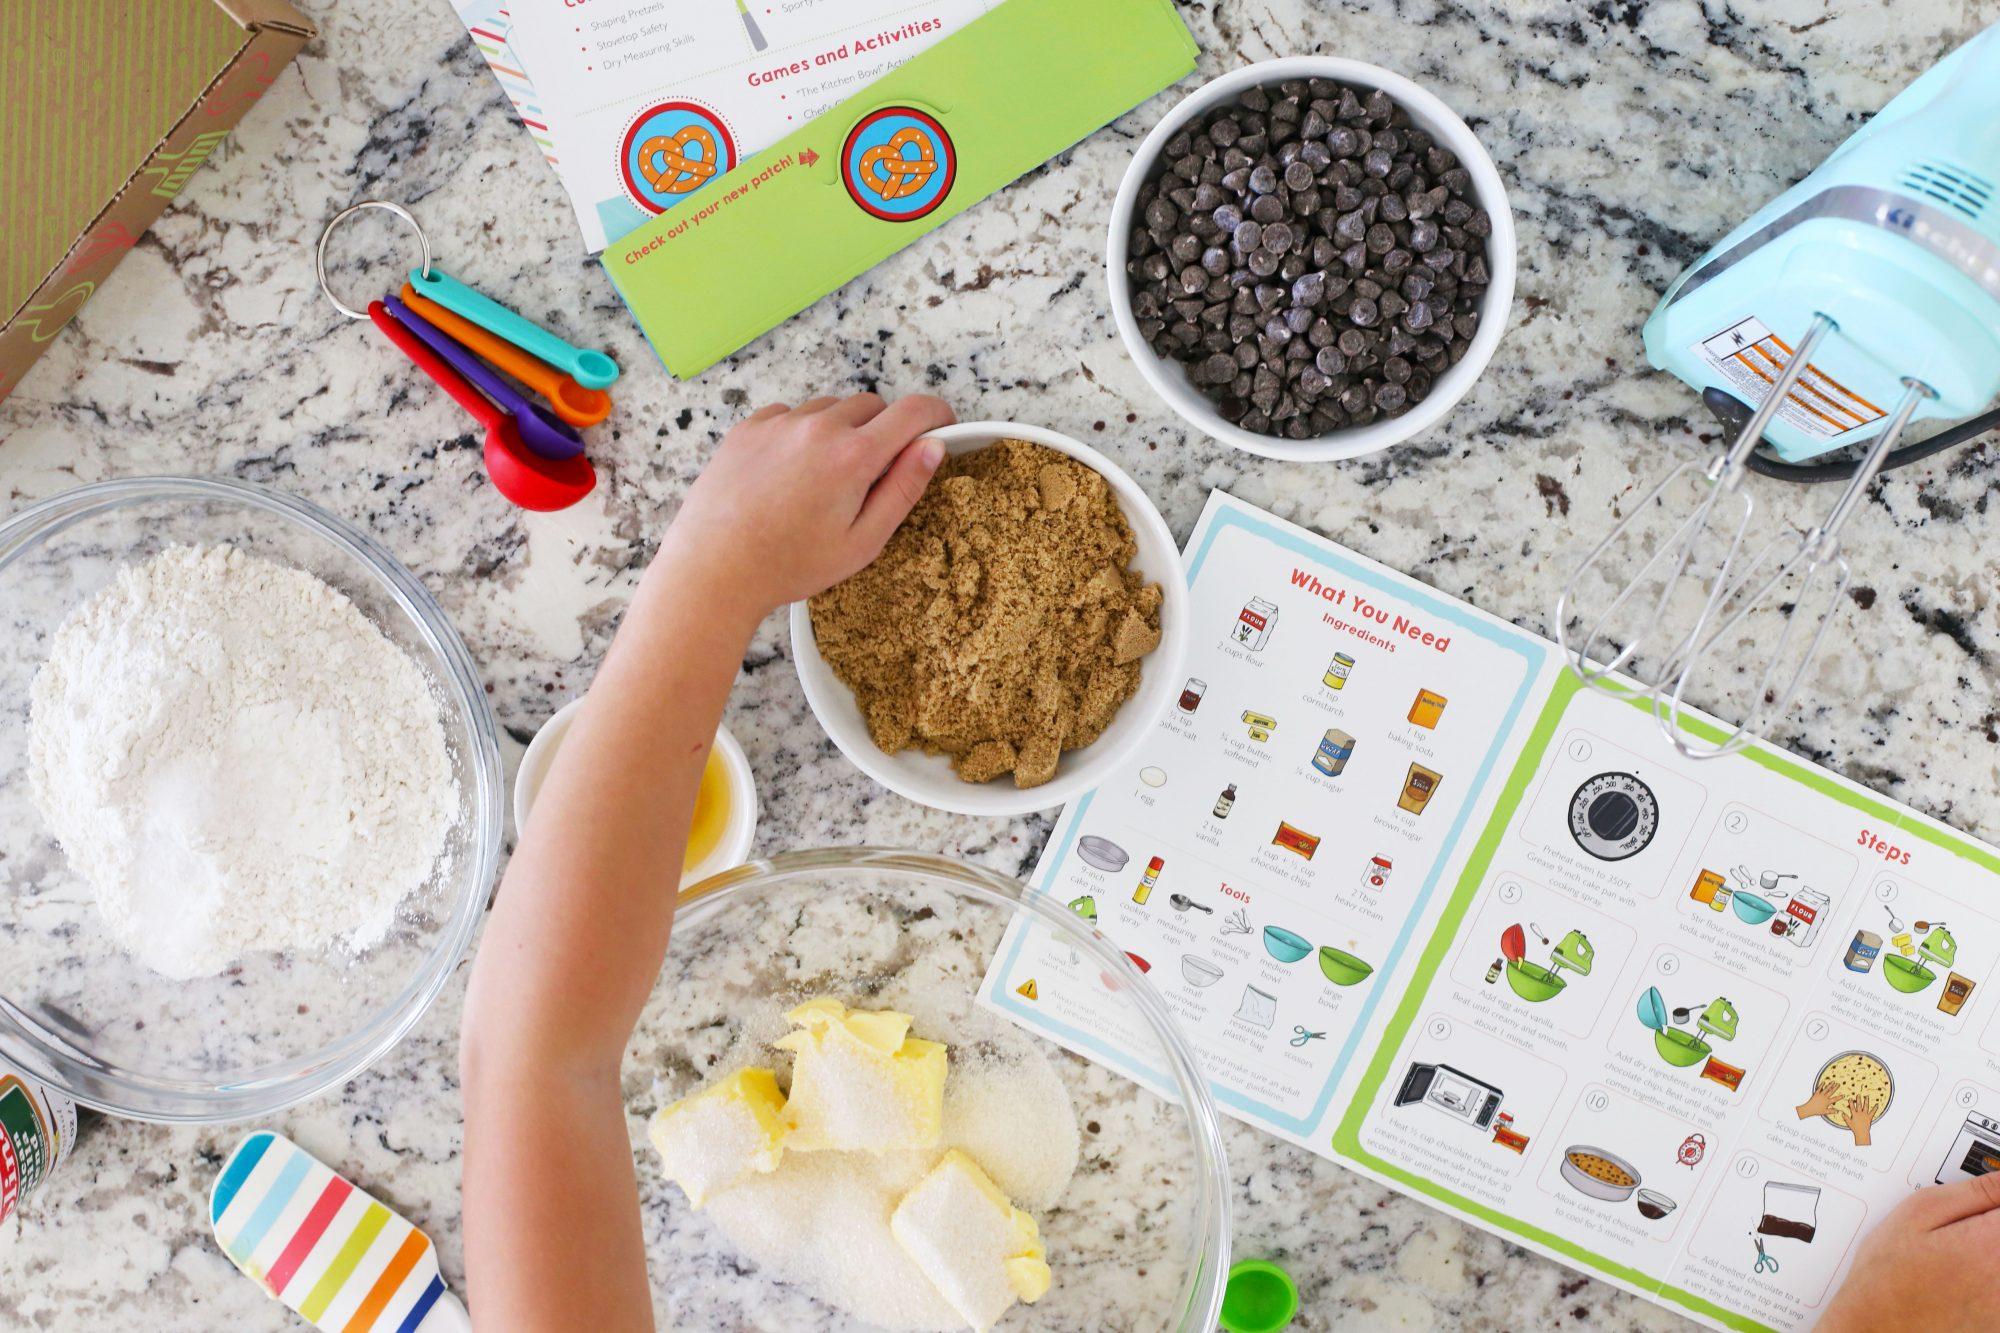 Raddish-Kids-Game-Day-Gourmet18